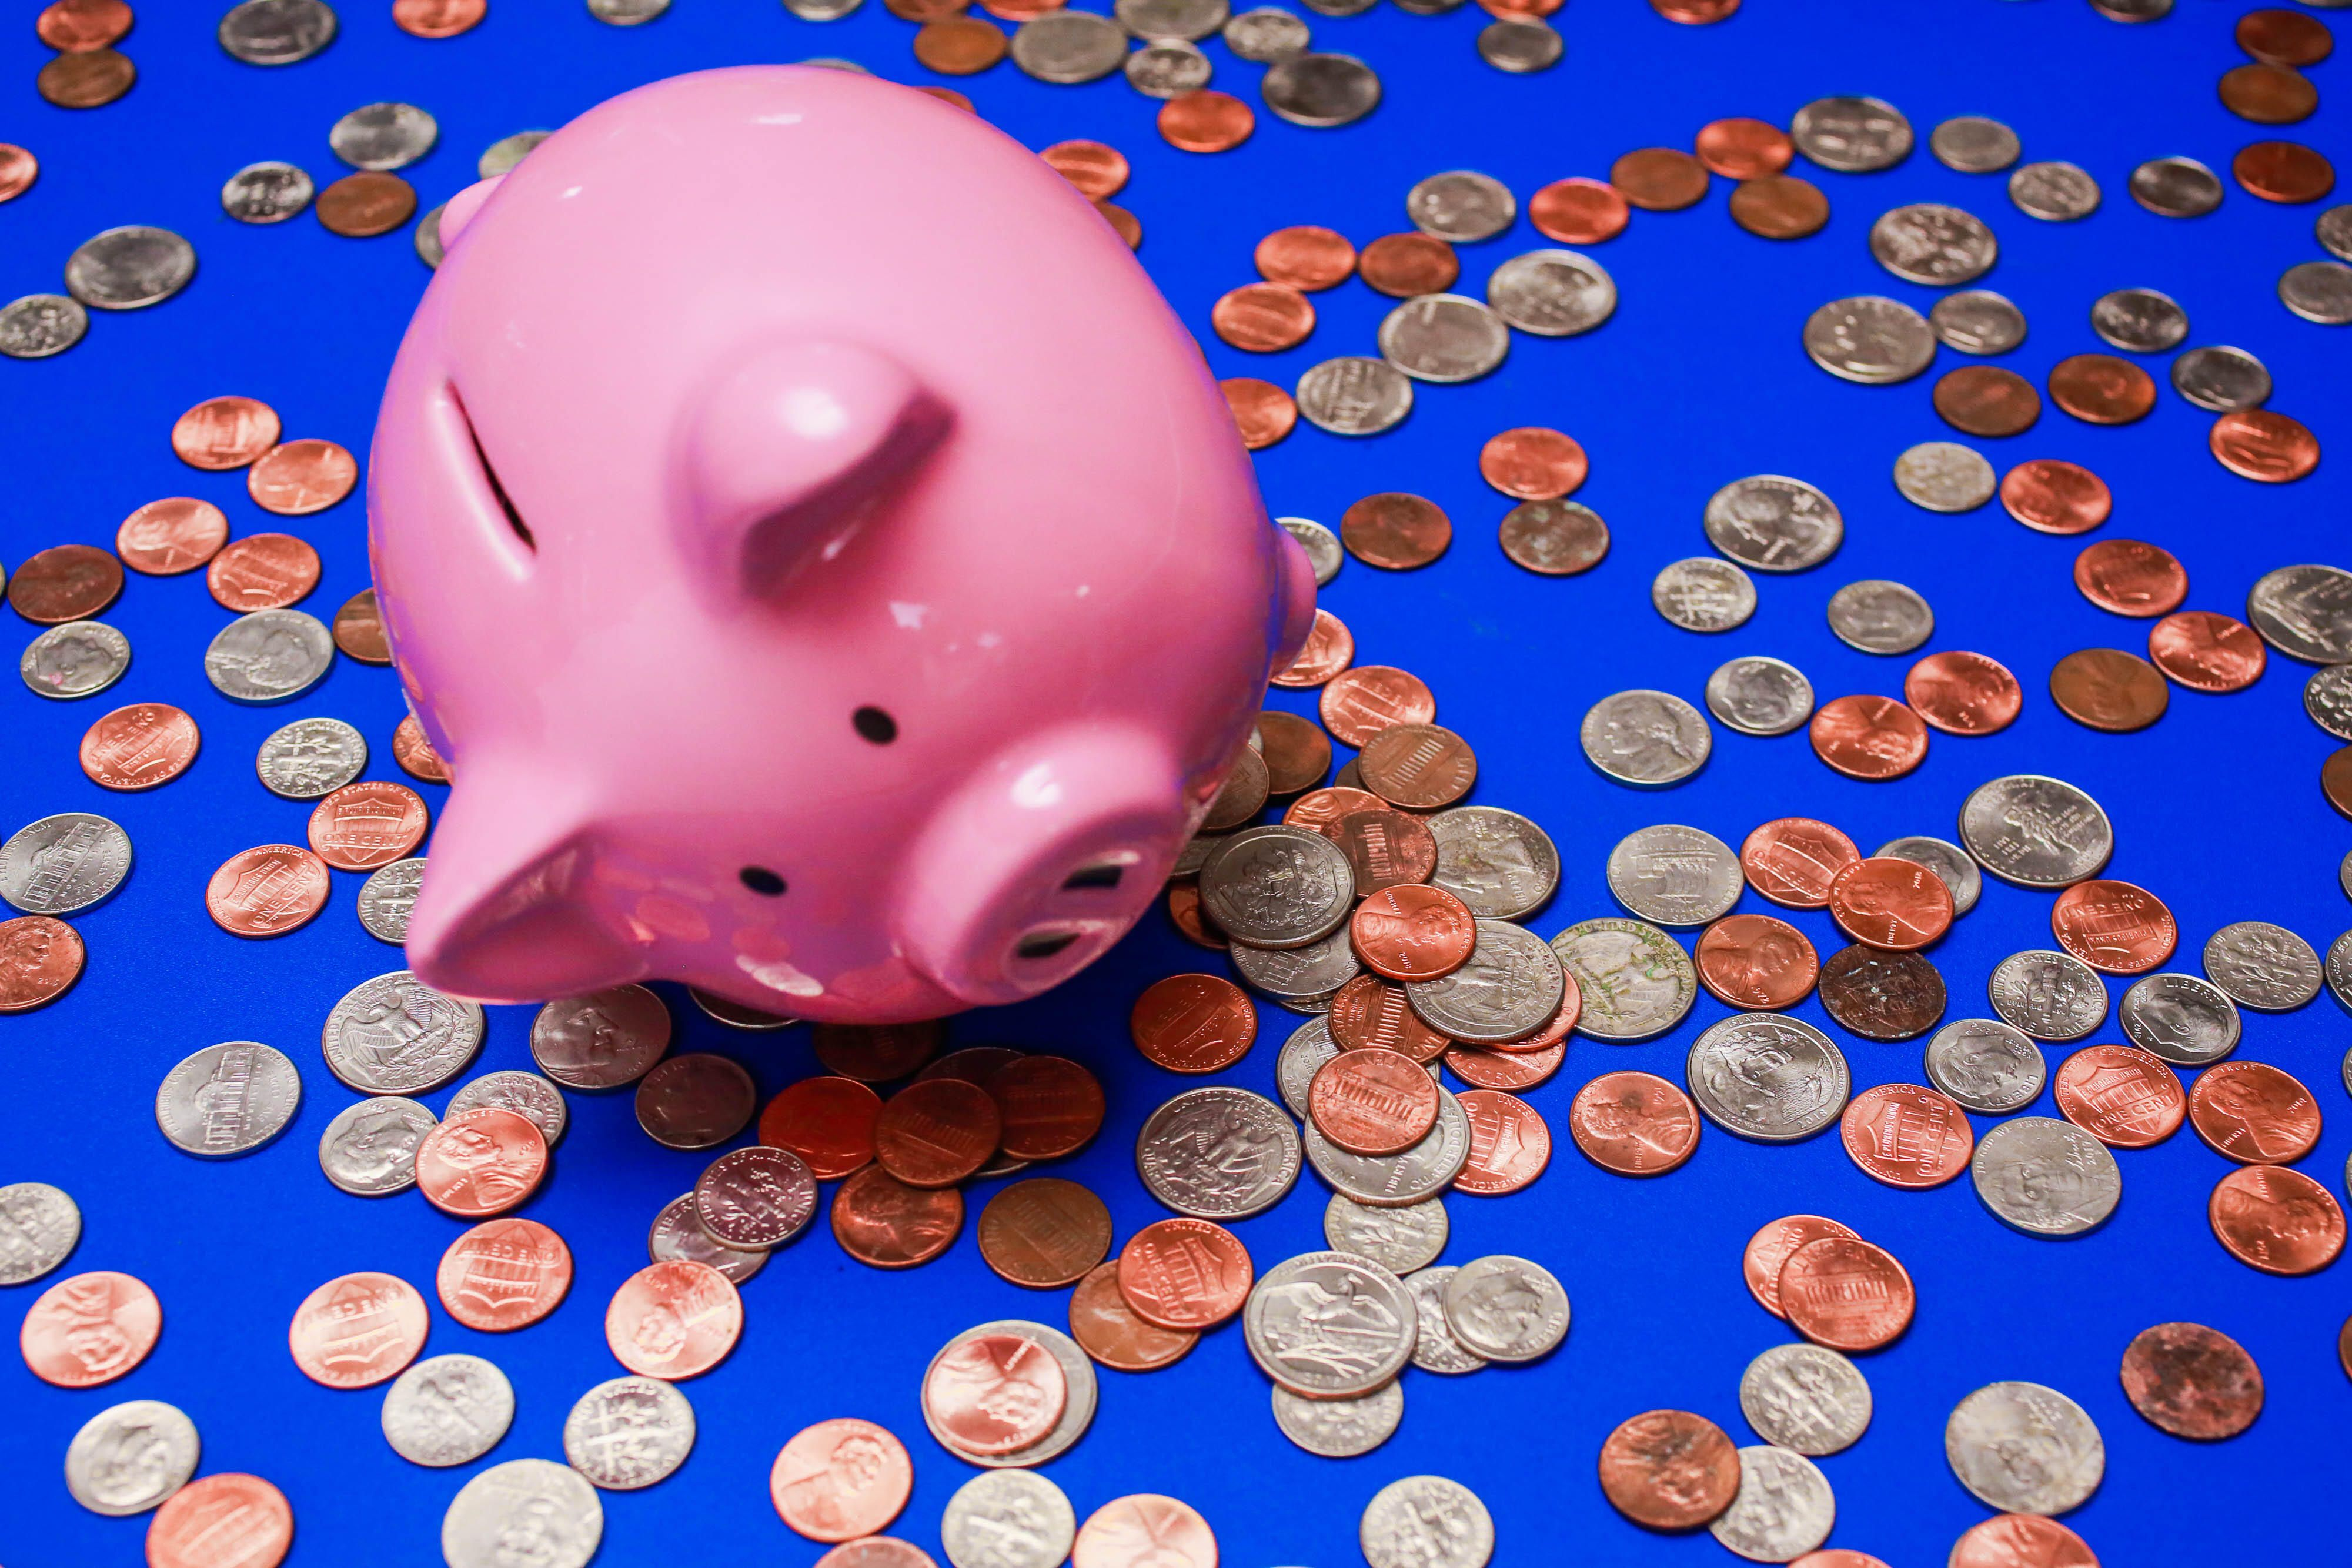 breaking-the-piggy-bank-stimulus-check-cash-money-savings-debt-personal-finance-029